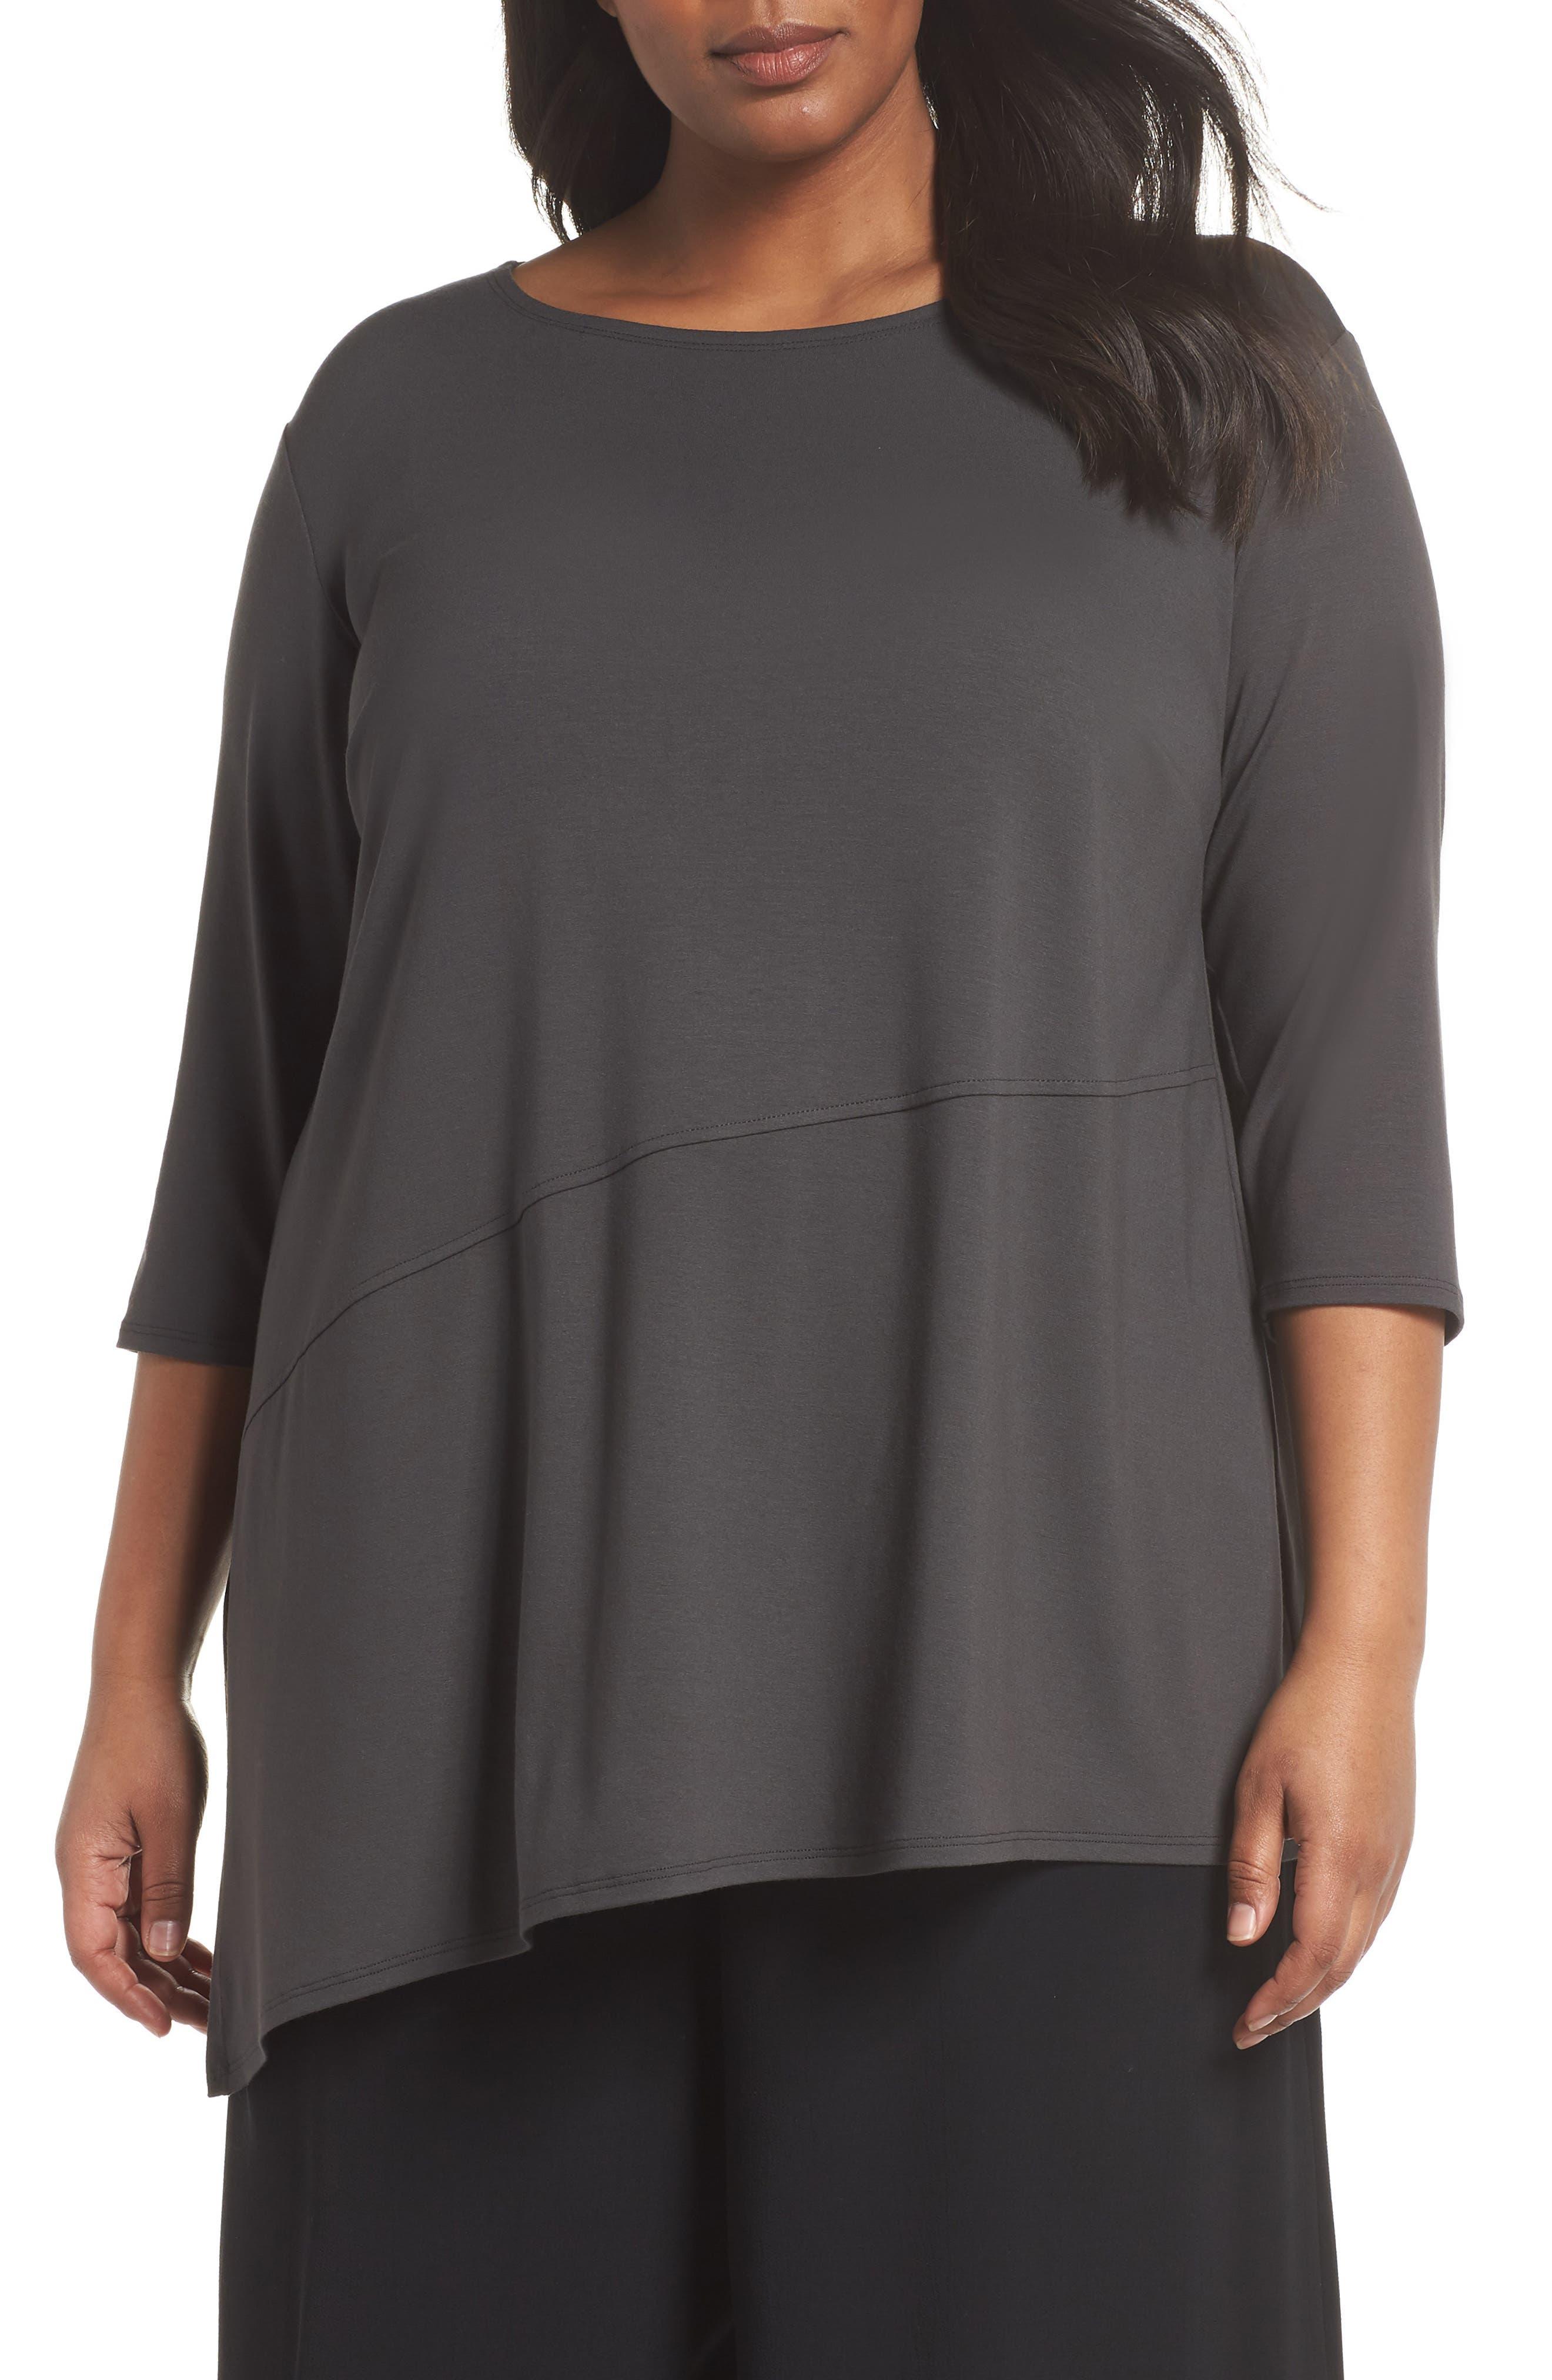 Jewel Neck Asymmetrical Top,                         Main,                         color, Graphite